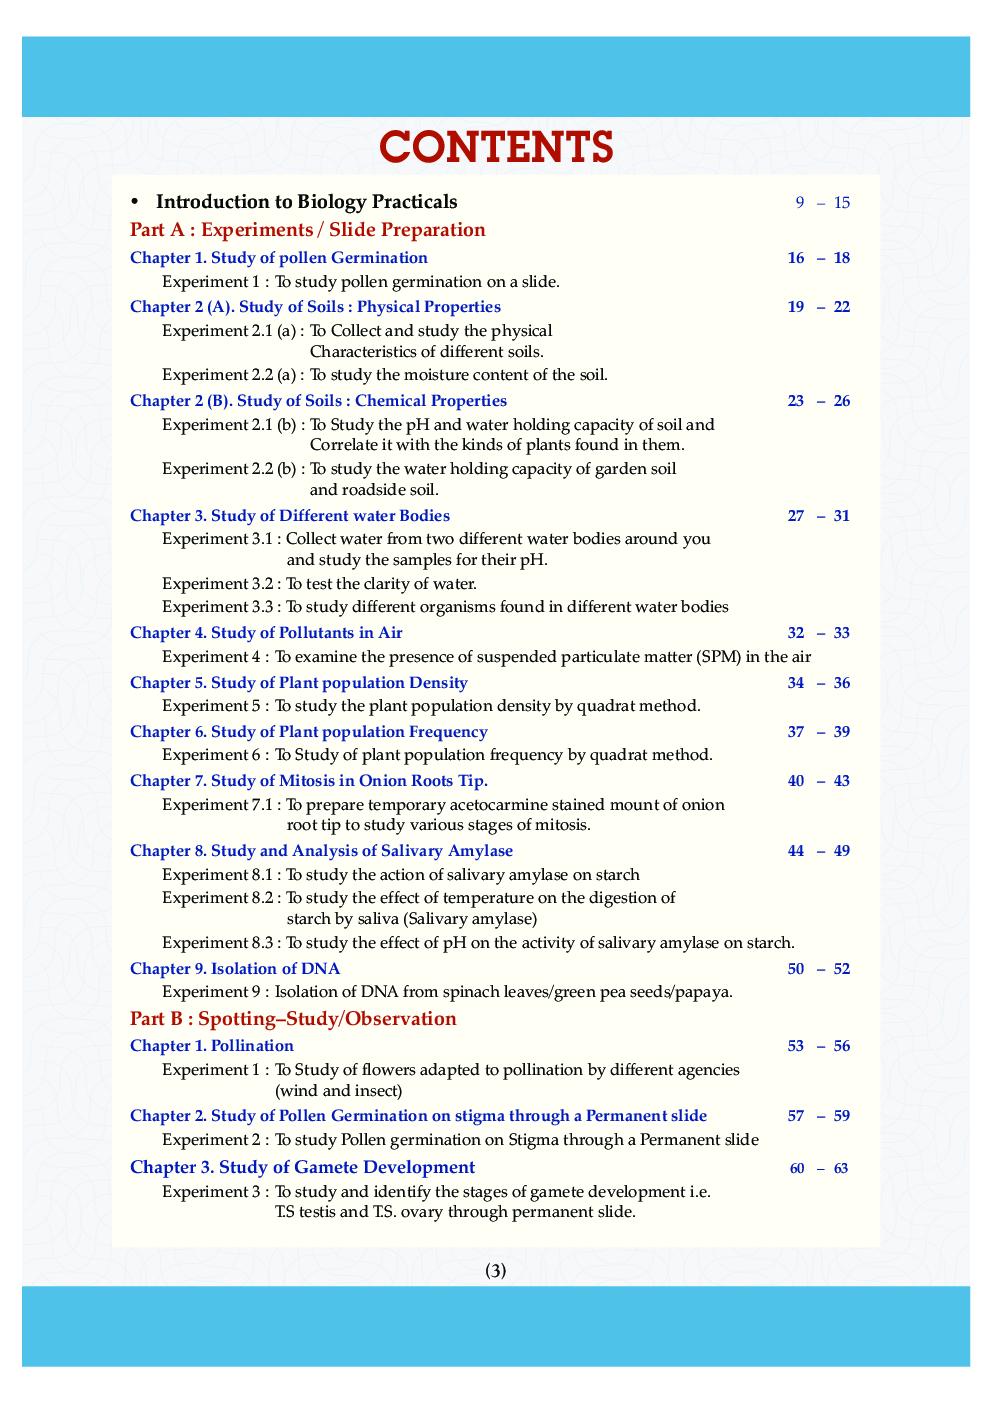 Download Class 11 Biology Notes PDF | Vidyakul